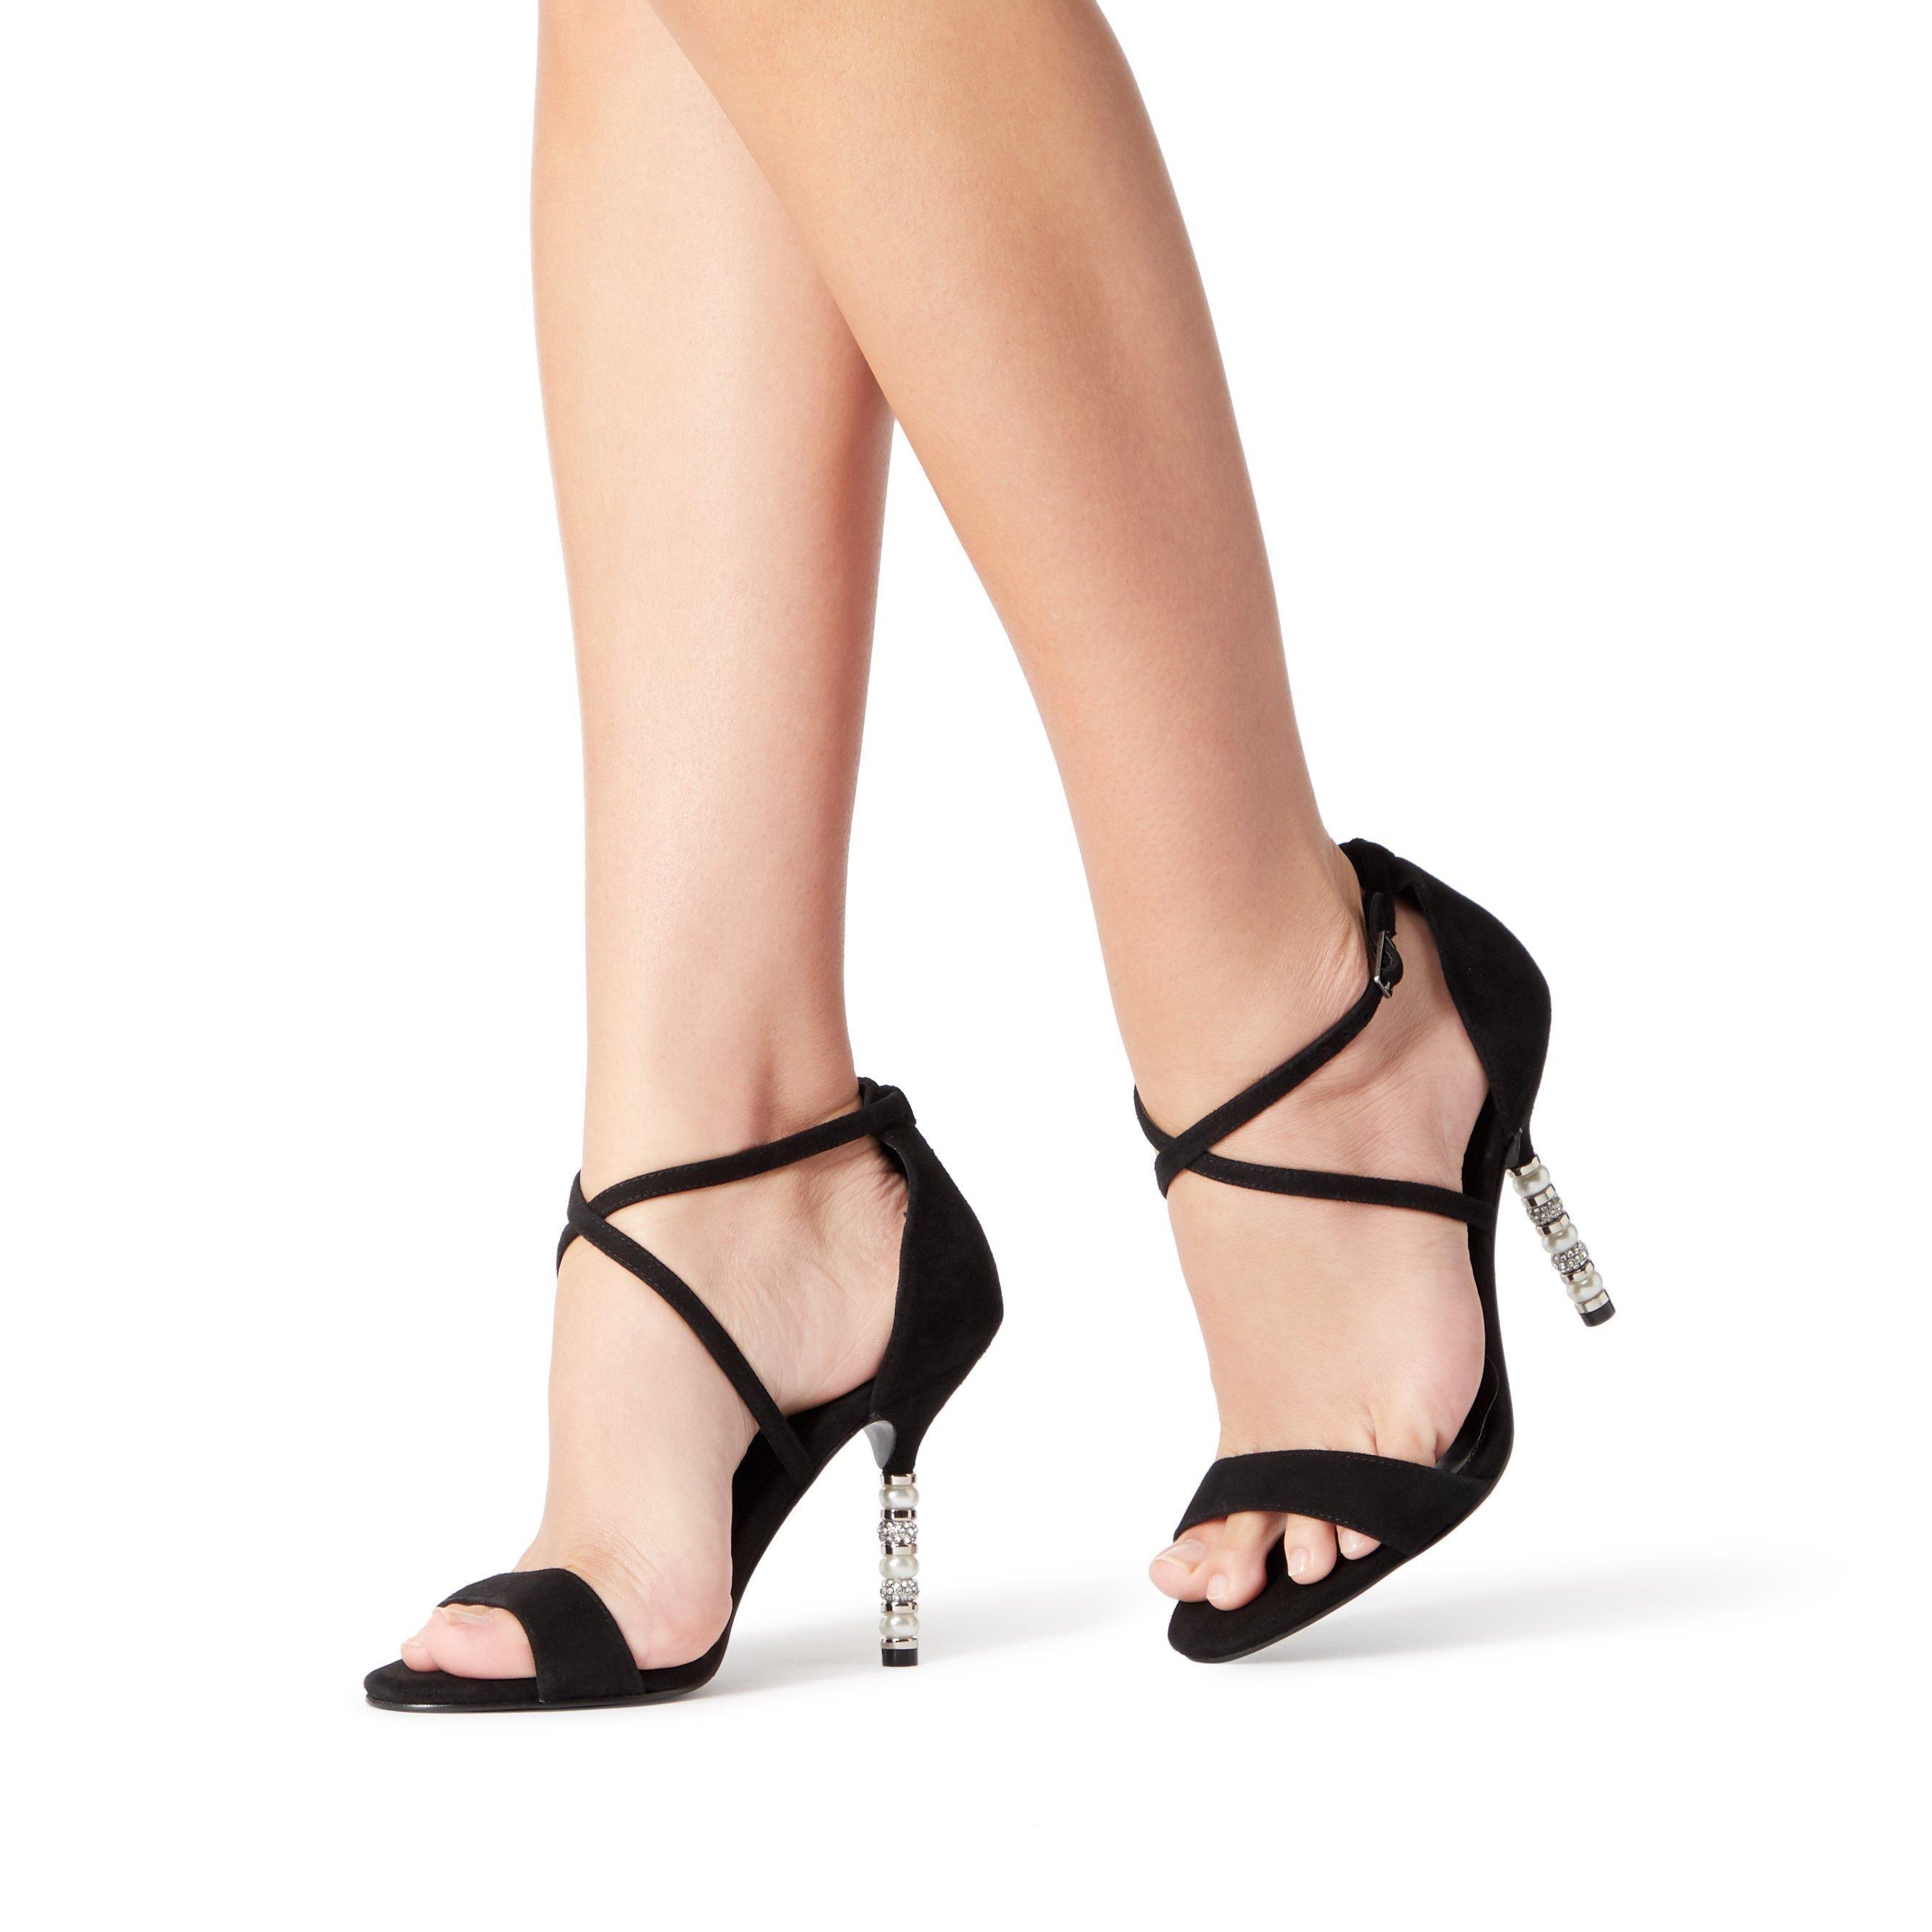 Dune Ladies MALIBU Crystal Embellished High Heel Sandal